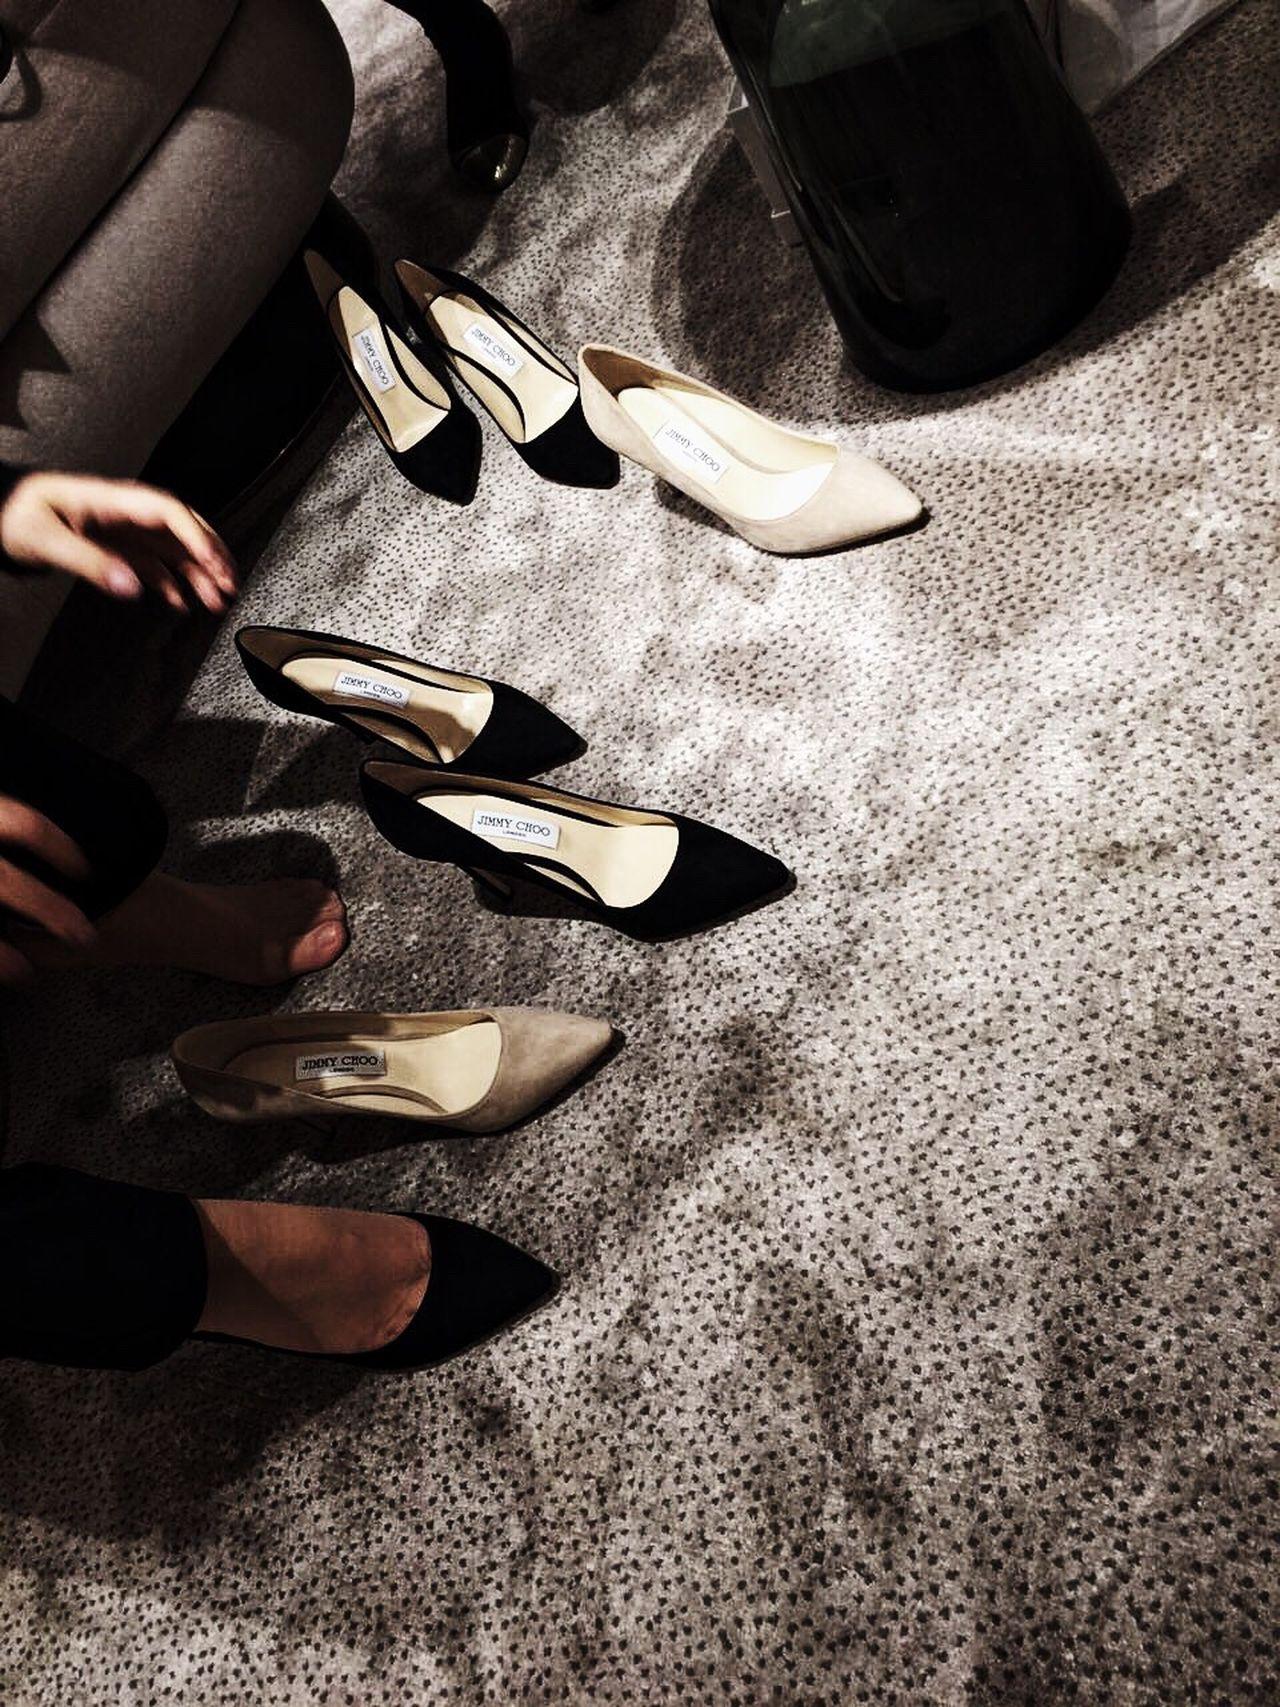 Difficult Choice 🙈 Shoe Fashion High Heels Human Leg Lifestyles Women Jimmychoo